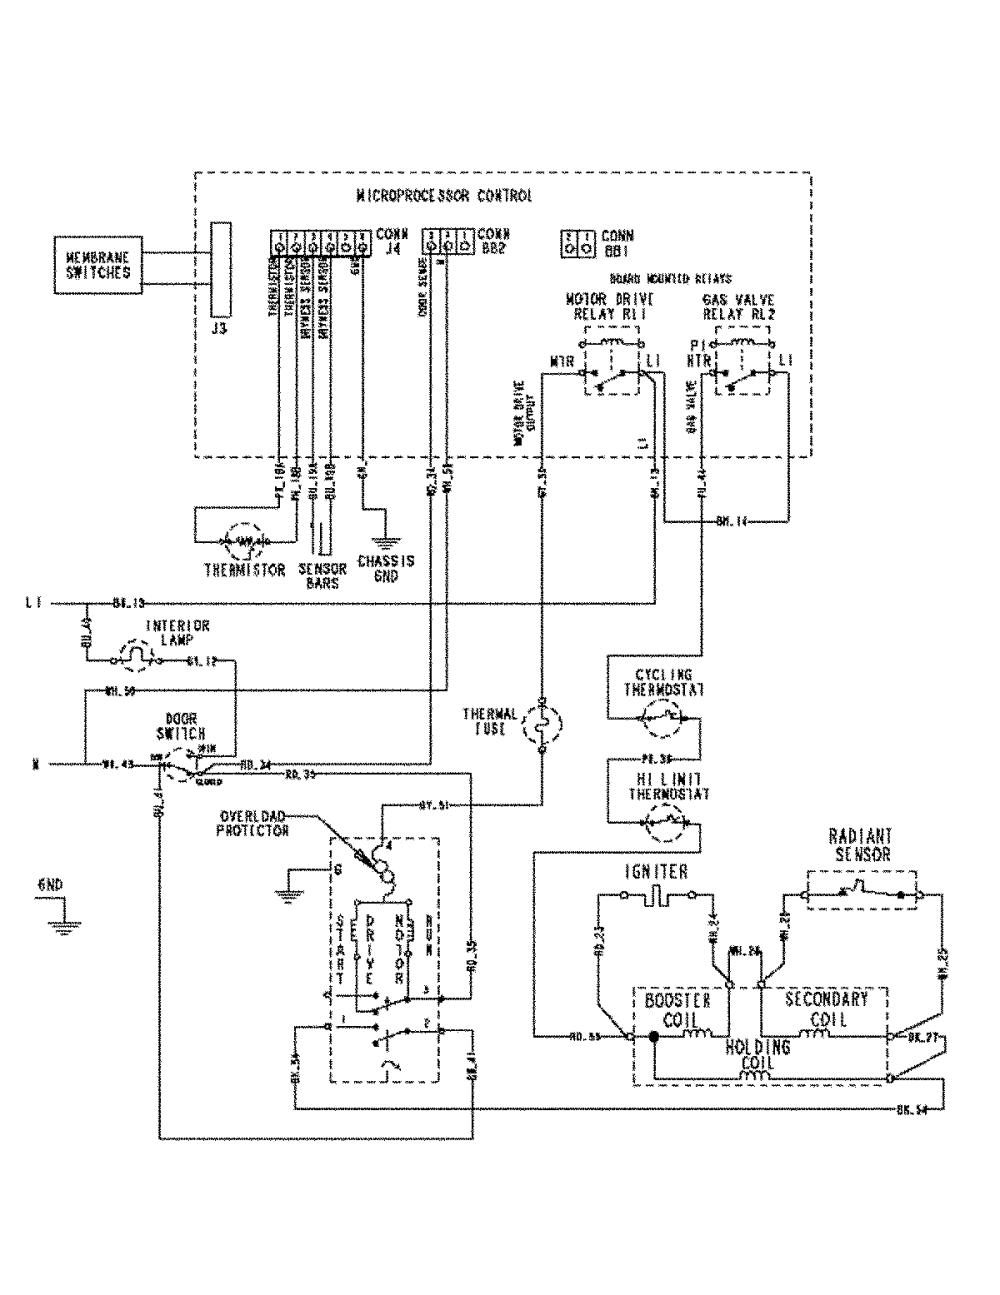 medium resolution of wiring diagram maytag dryer